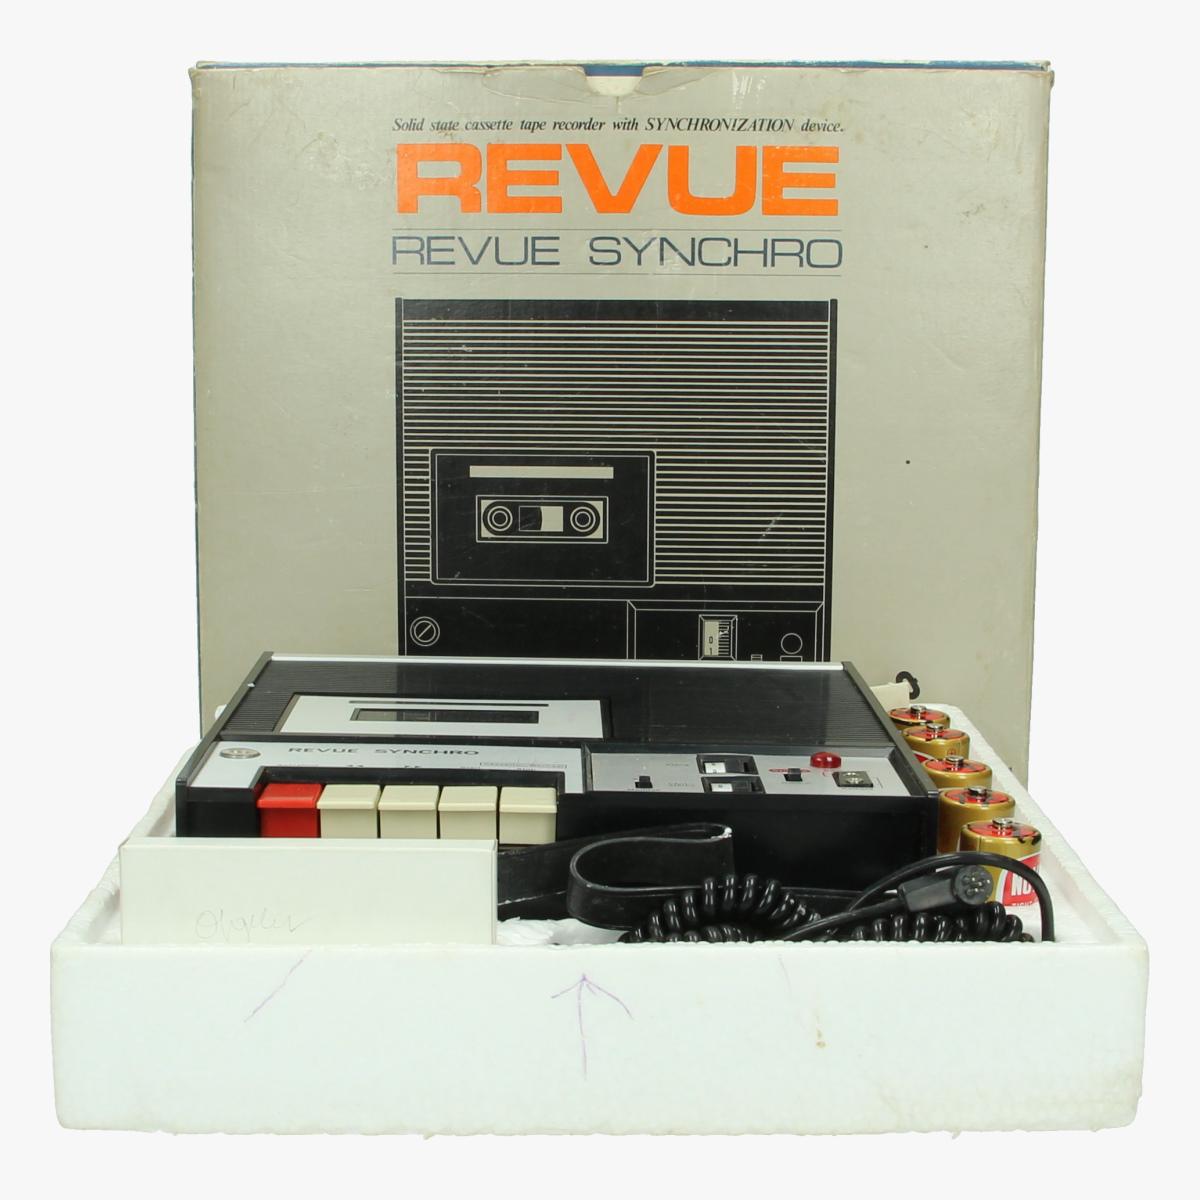 Afbeeldingen van Kasettenspeler, Revue Synchro , Tape Recorder Best. Nr. 8201